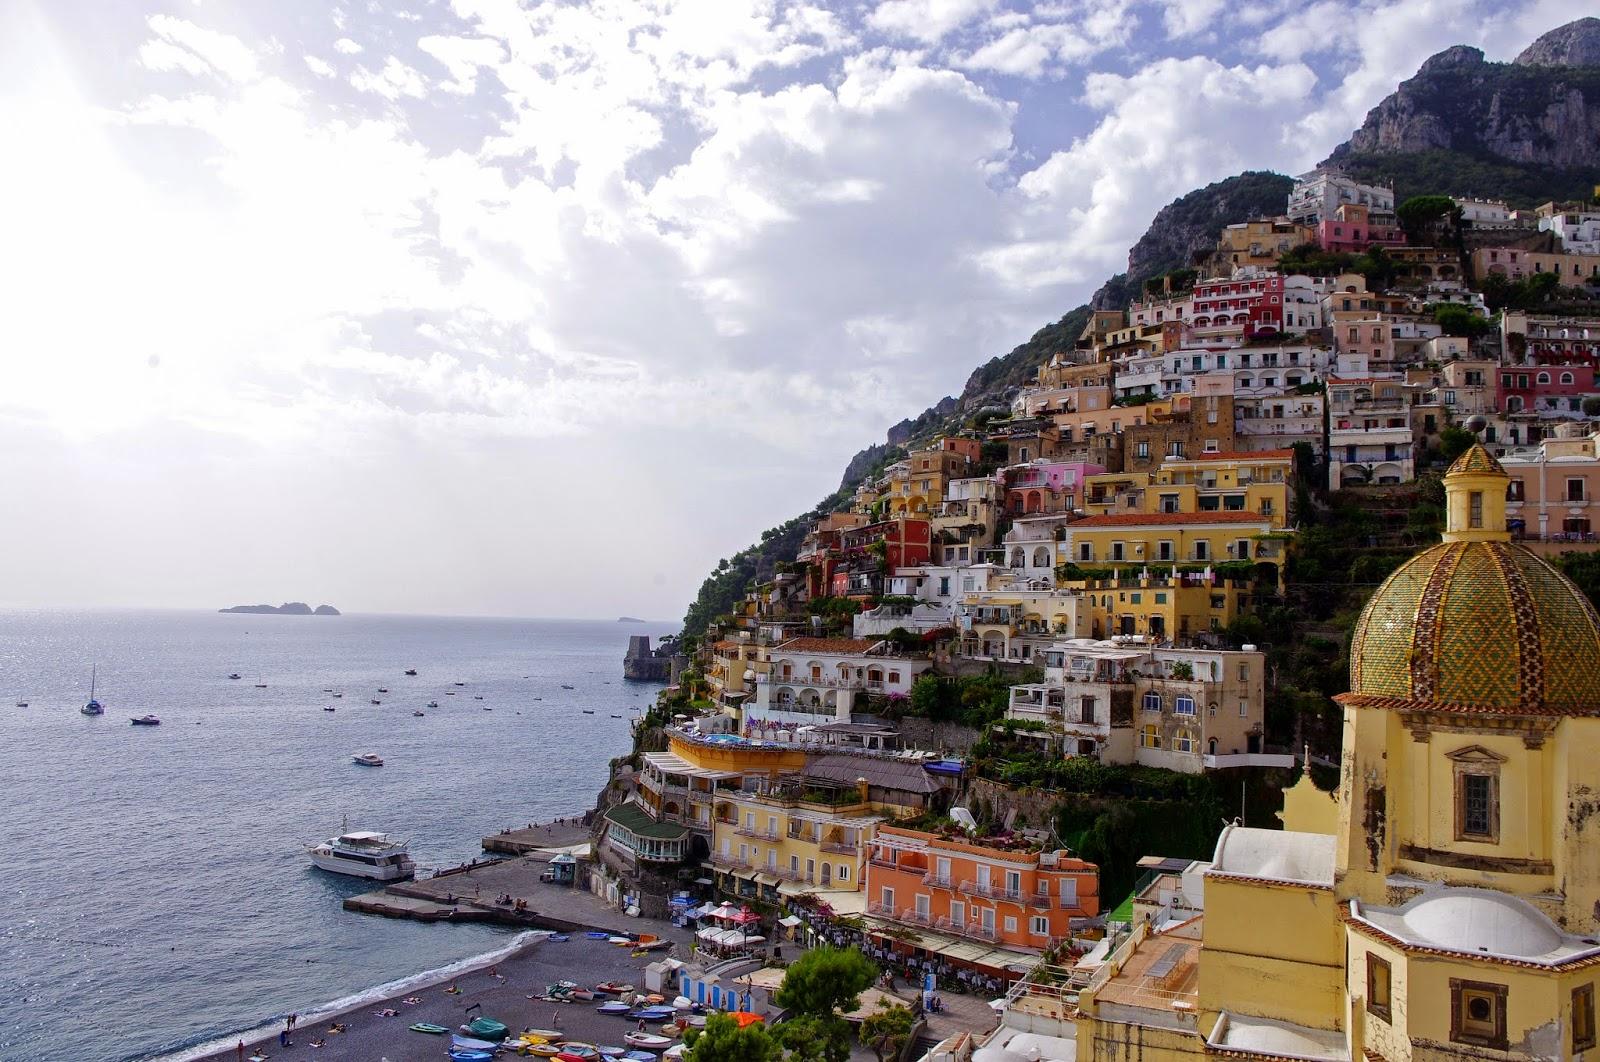 An Amalfi Coast Luxury Car Transfer with Italy Limousine